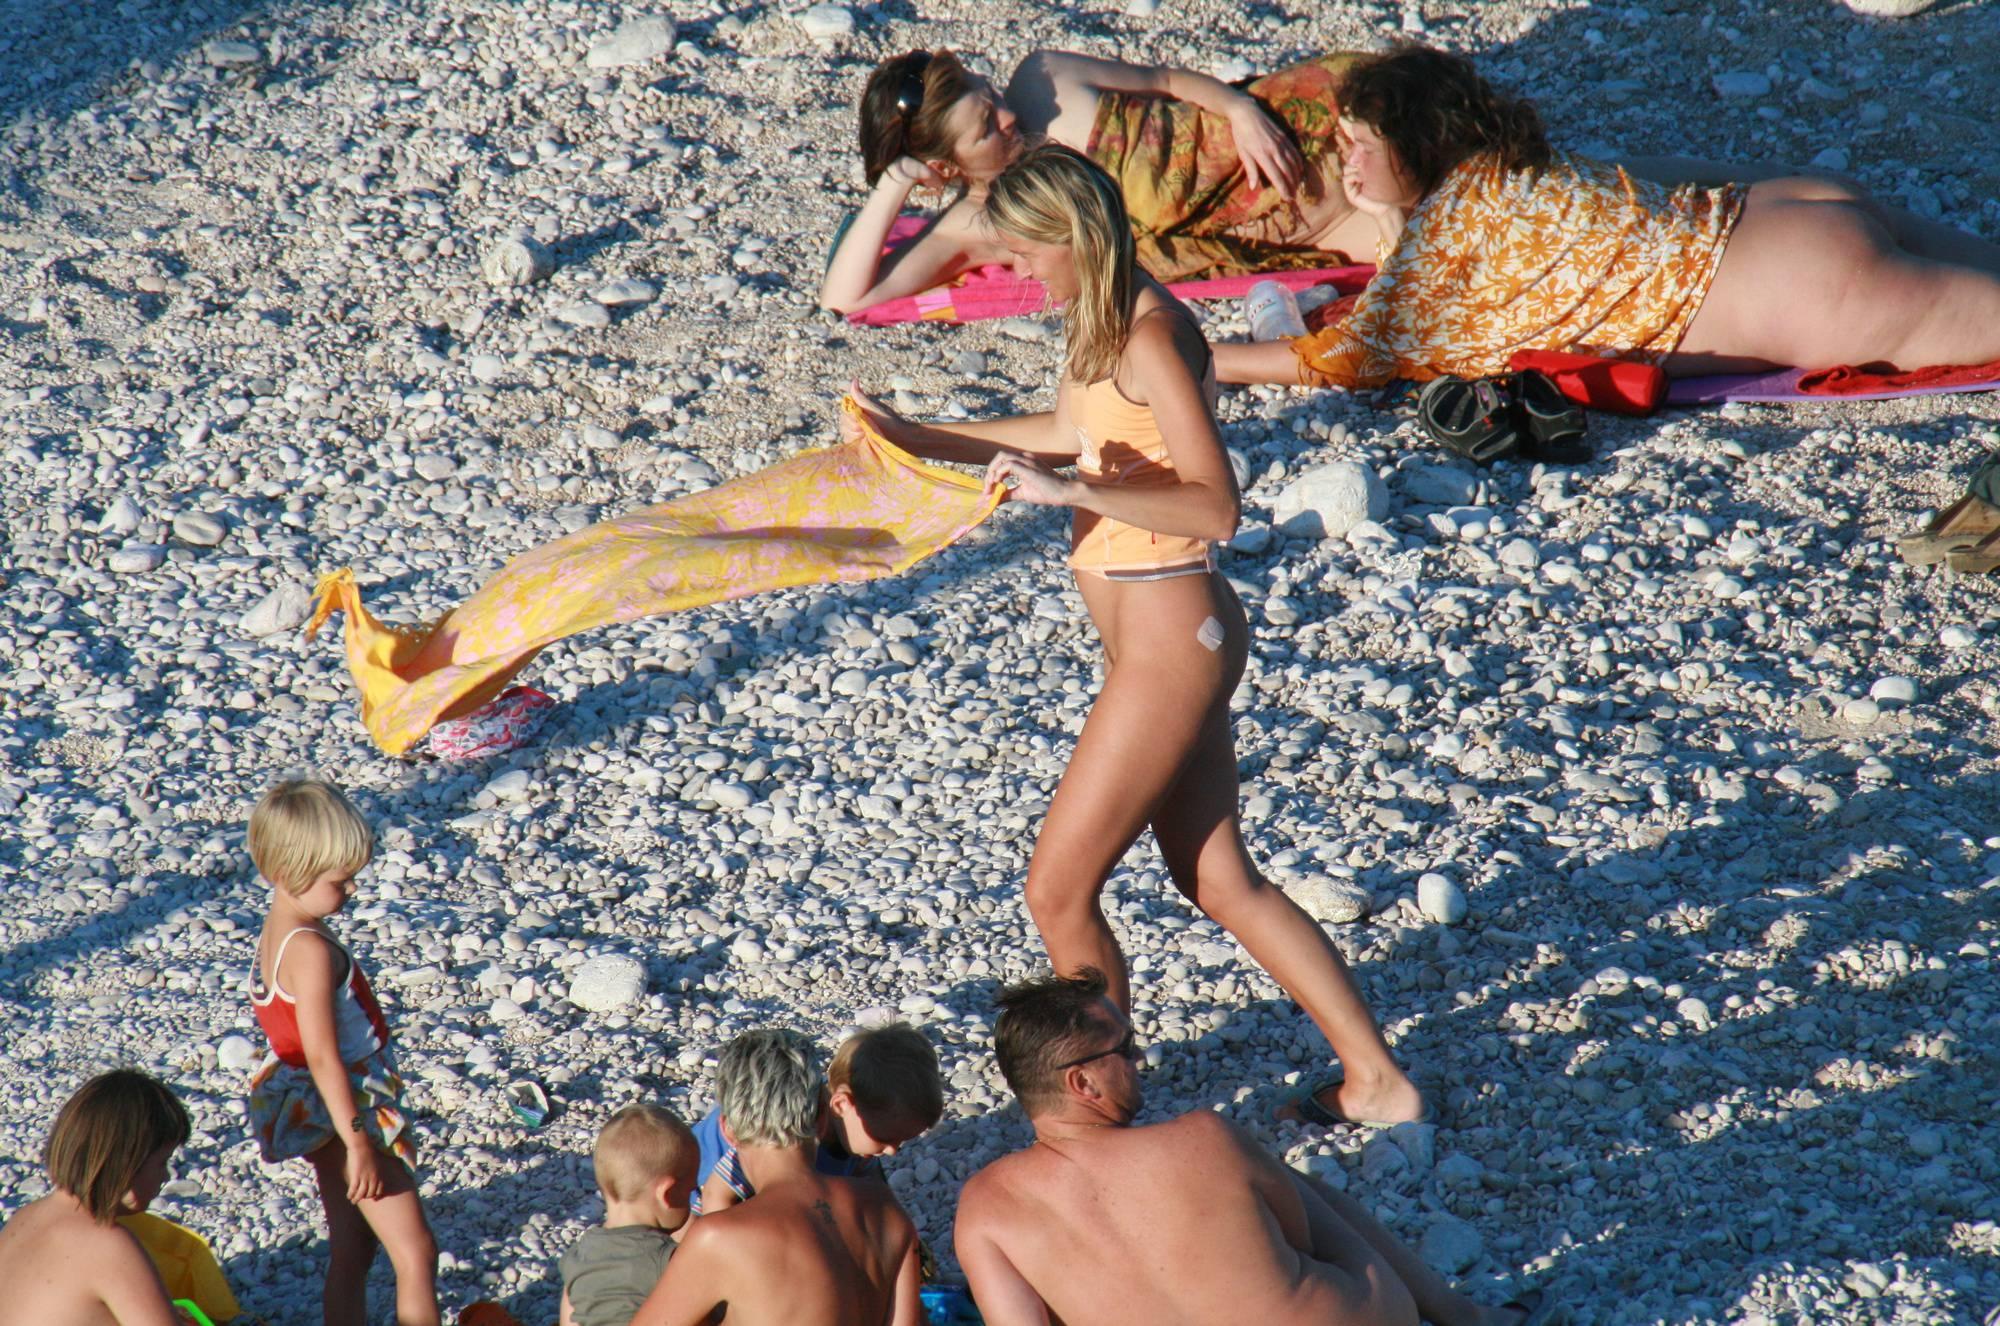 Nudist Pics Naturist Beach Family Two - 2